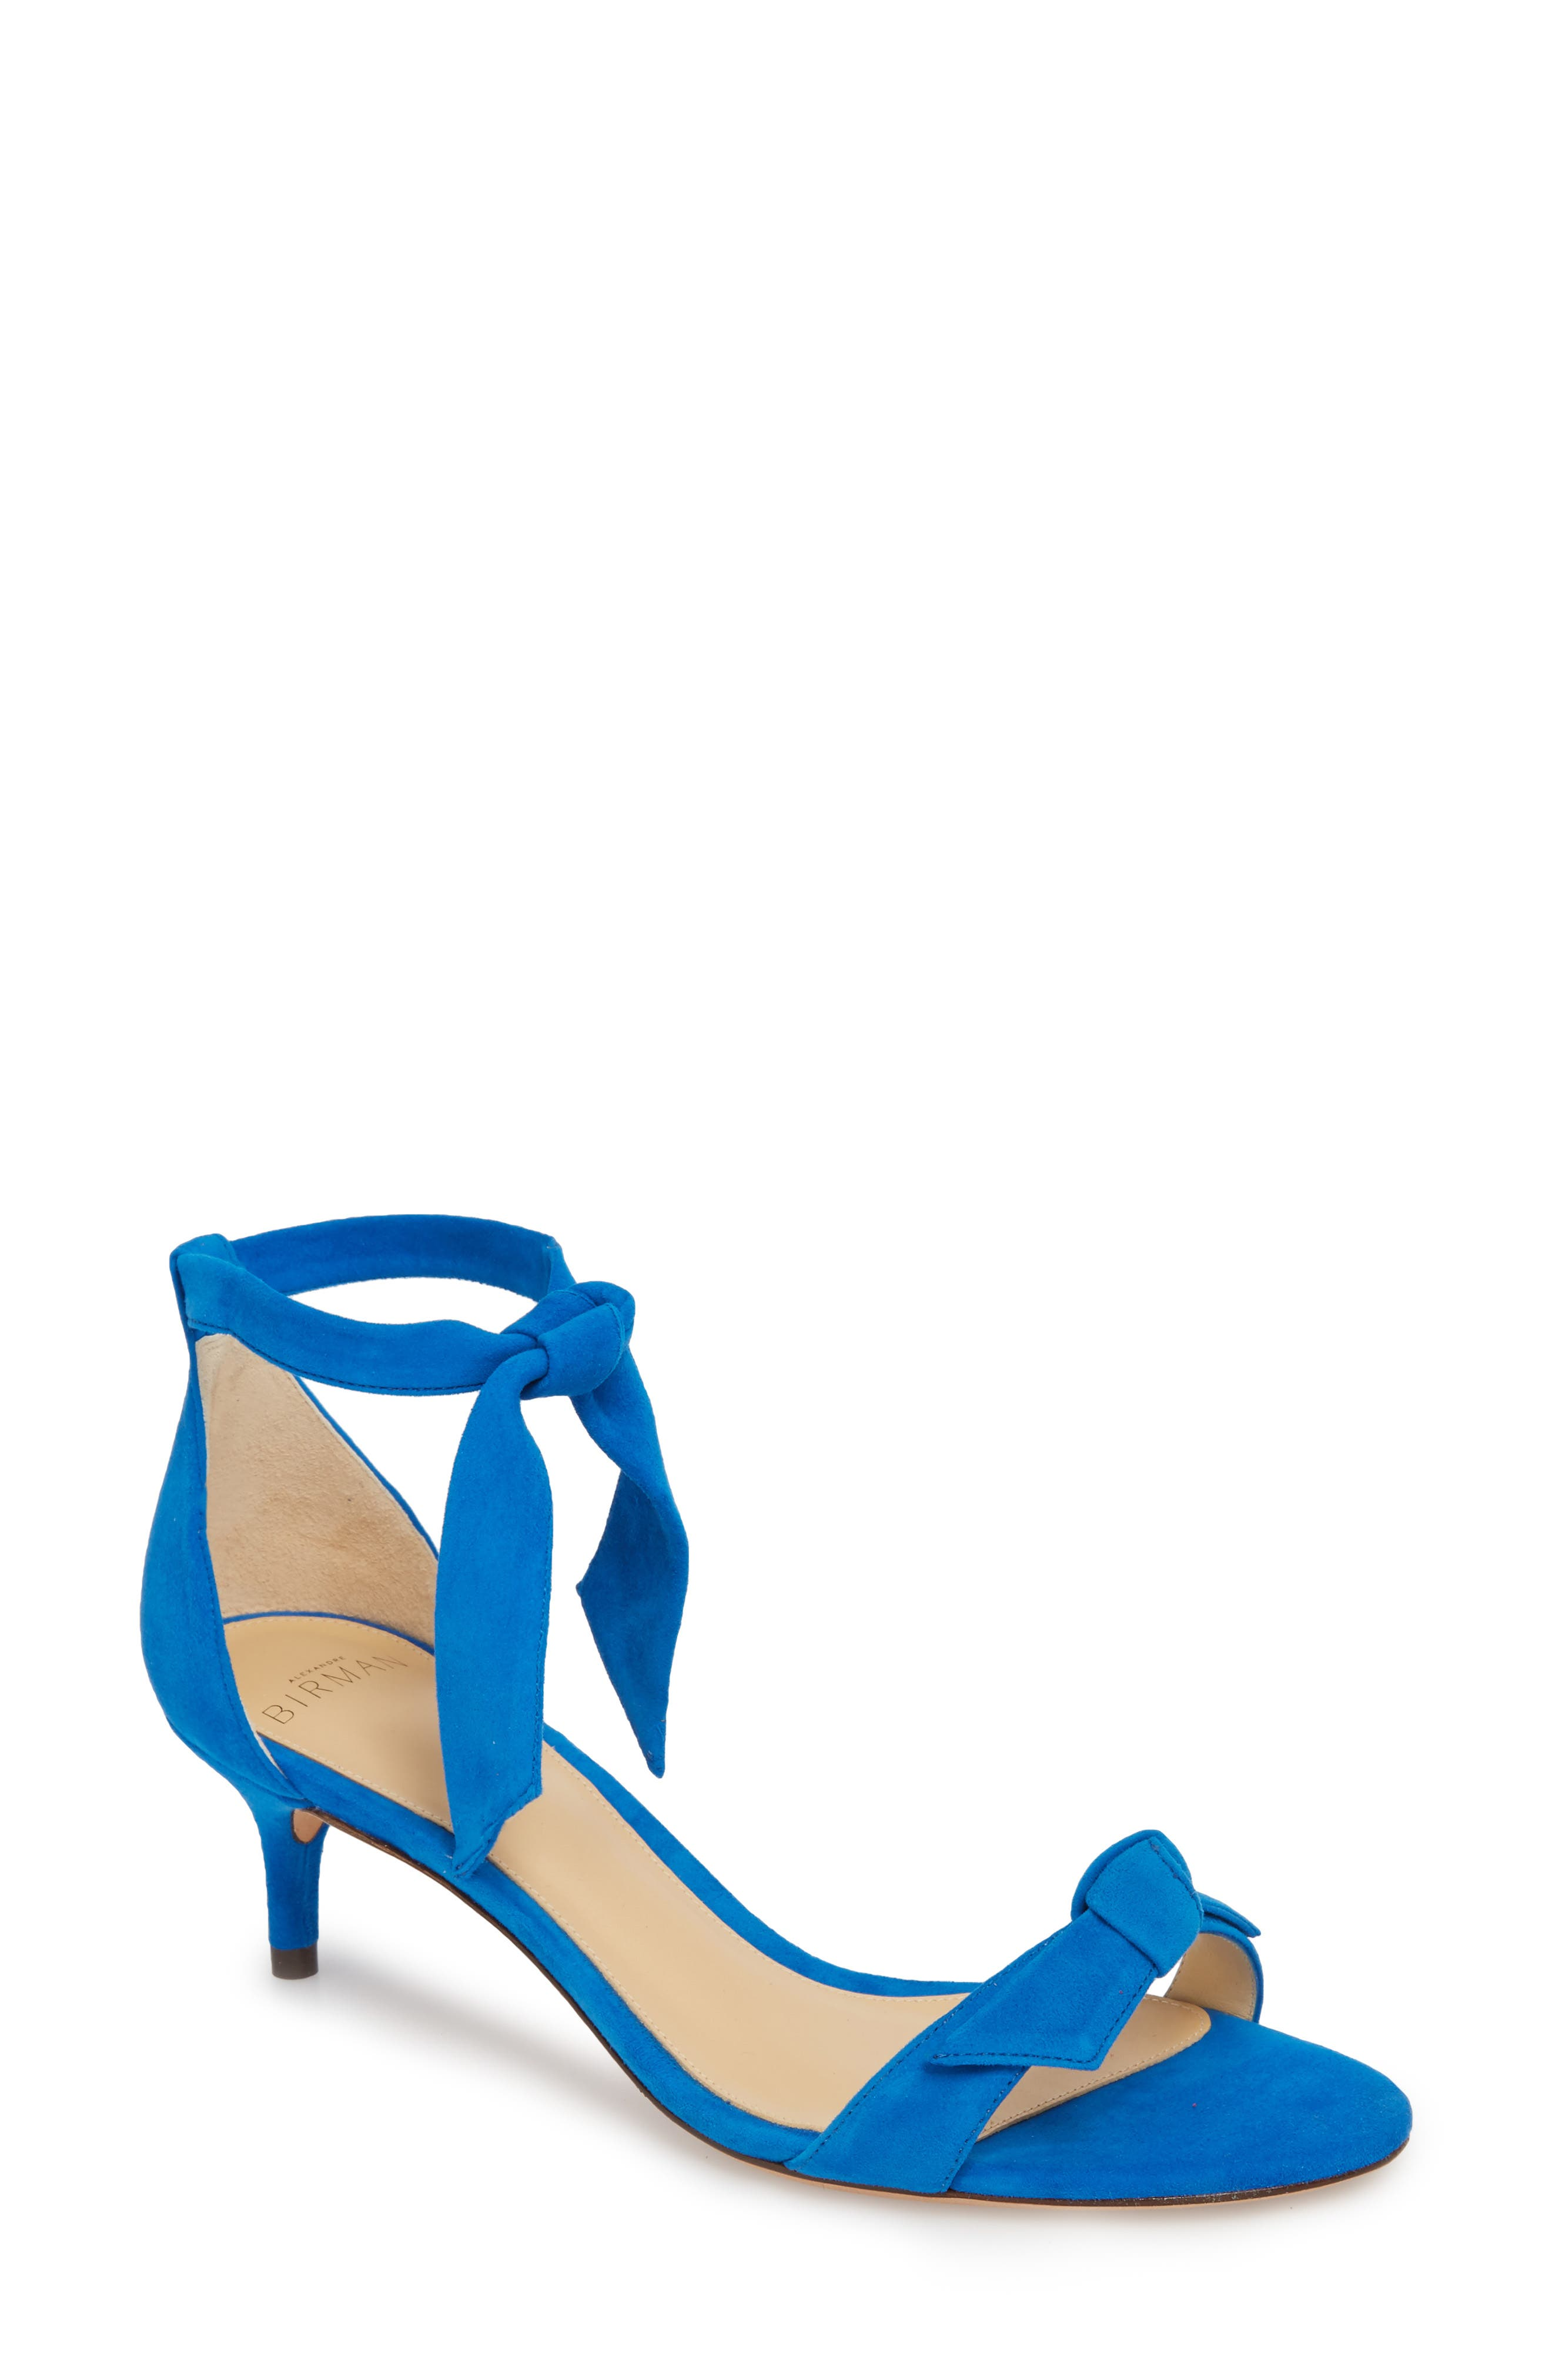 Main Image - Alexandre Birman Clarita Knotted Sandal (Women)